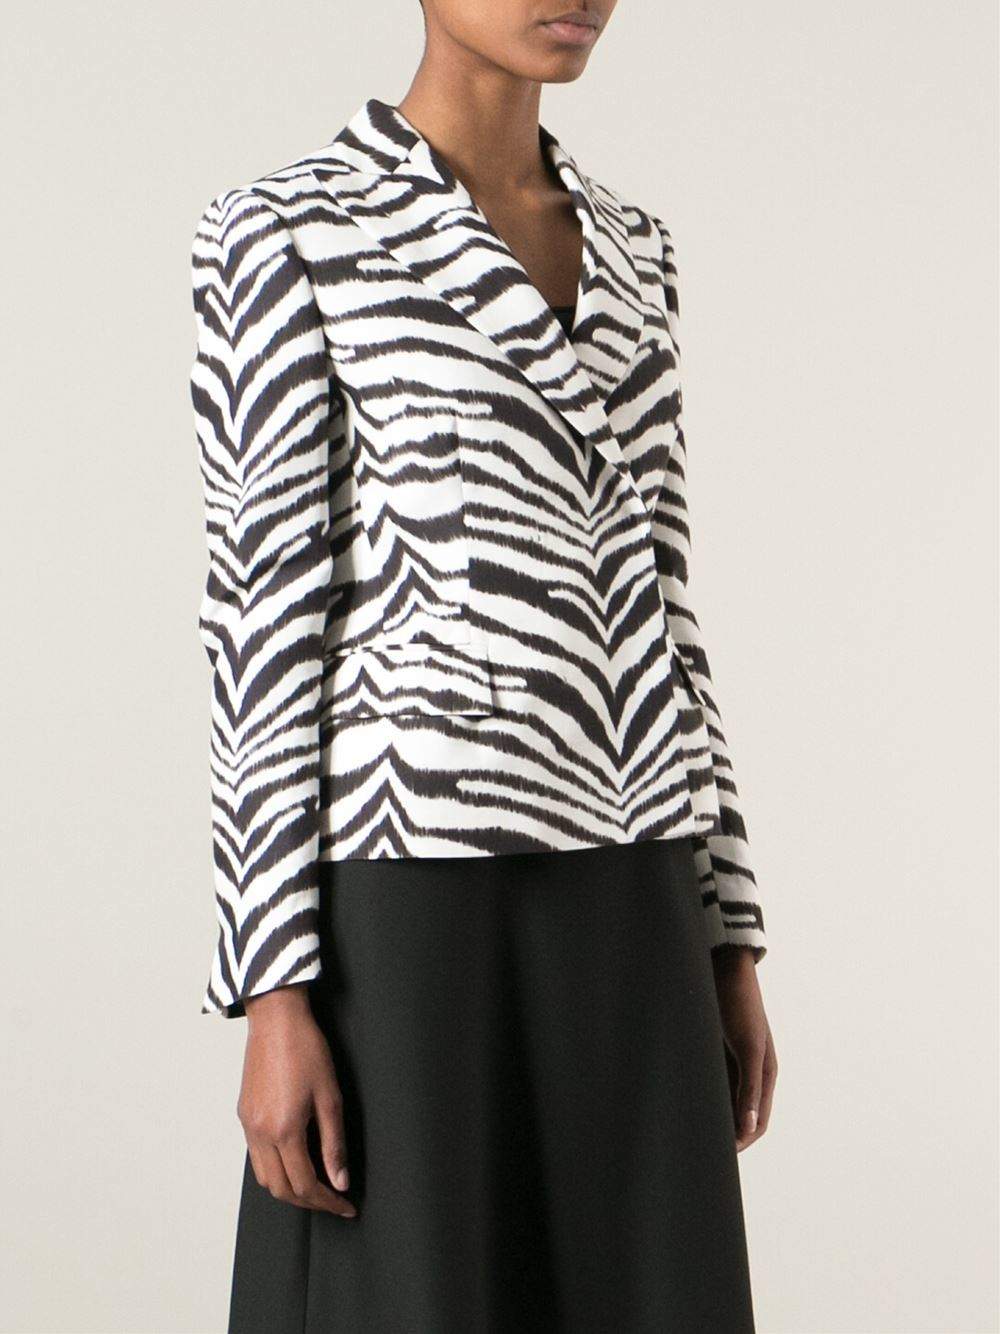 Emanuel Ungaro Zebra Print Jacket Women Cotton Rayon